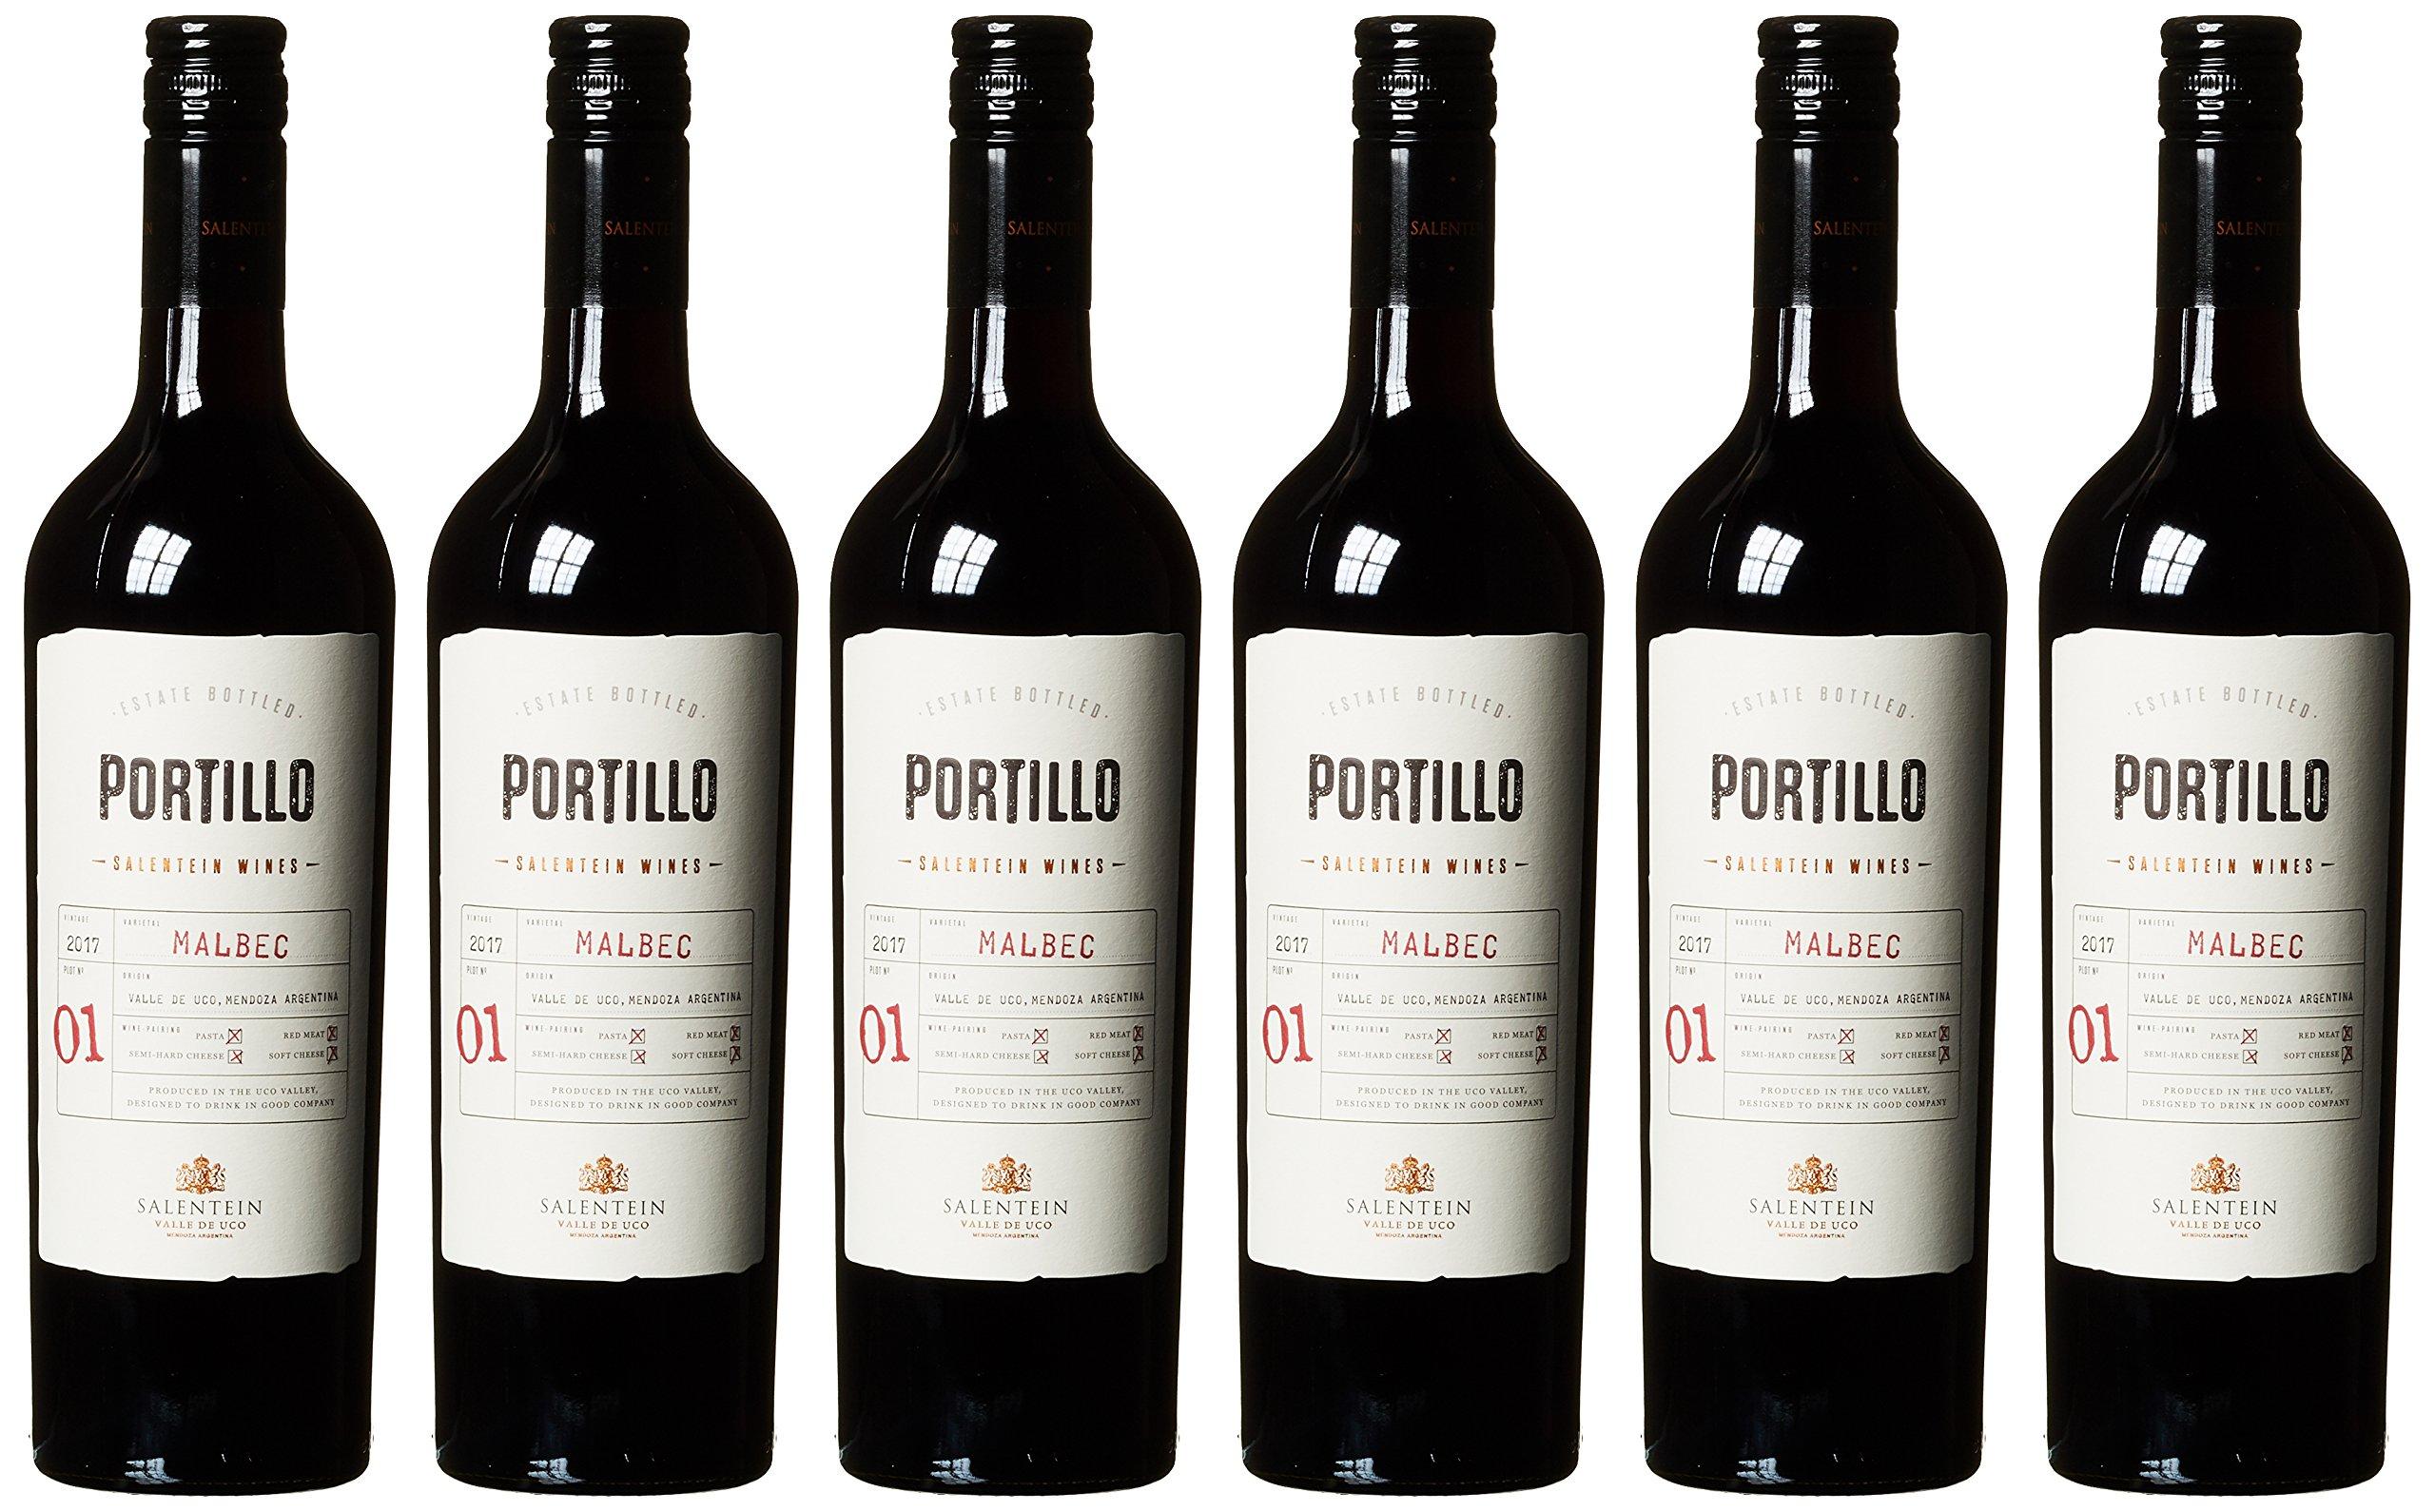 PORTILLO-MALBEC-2018-Trocken